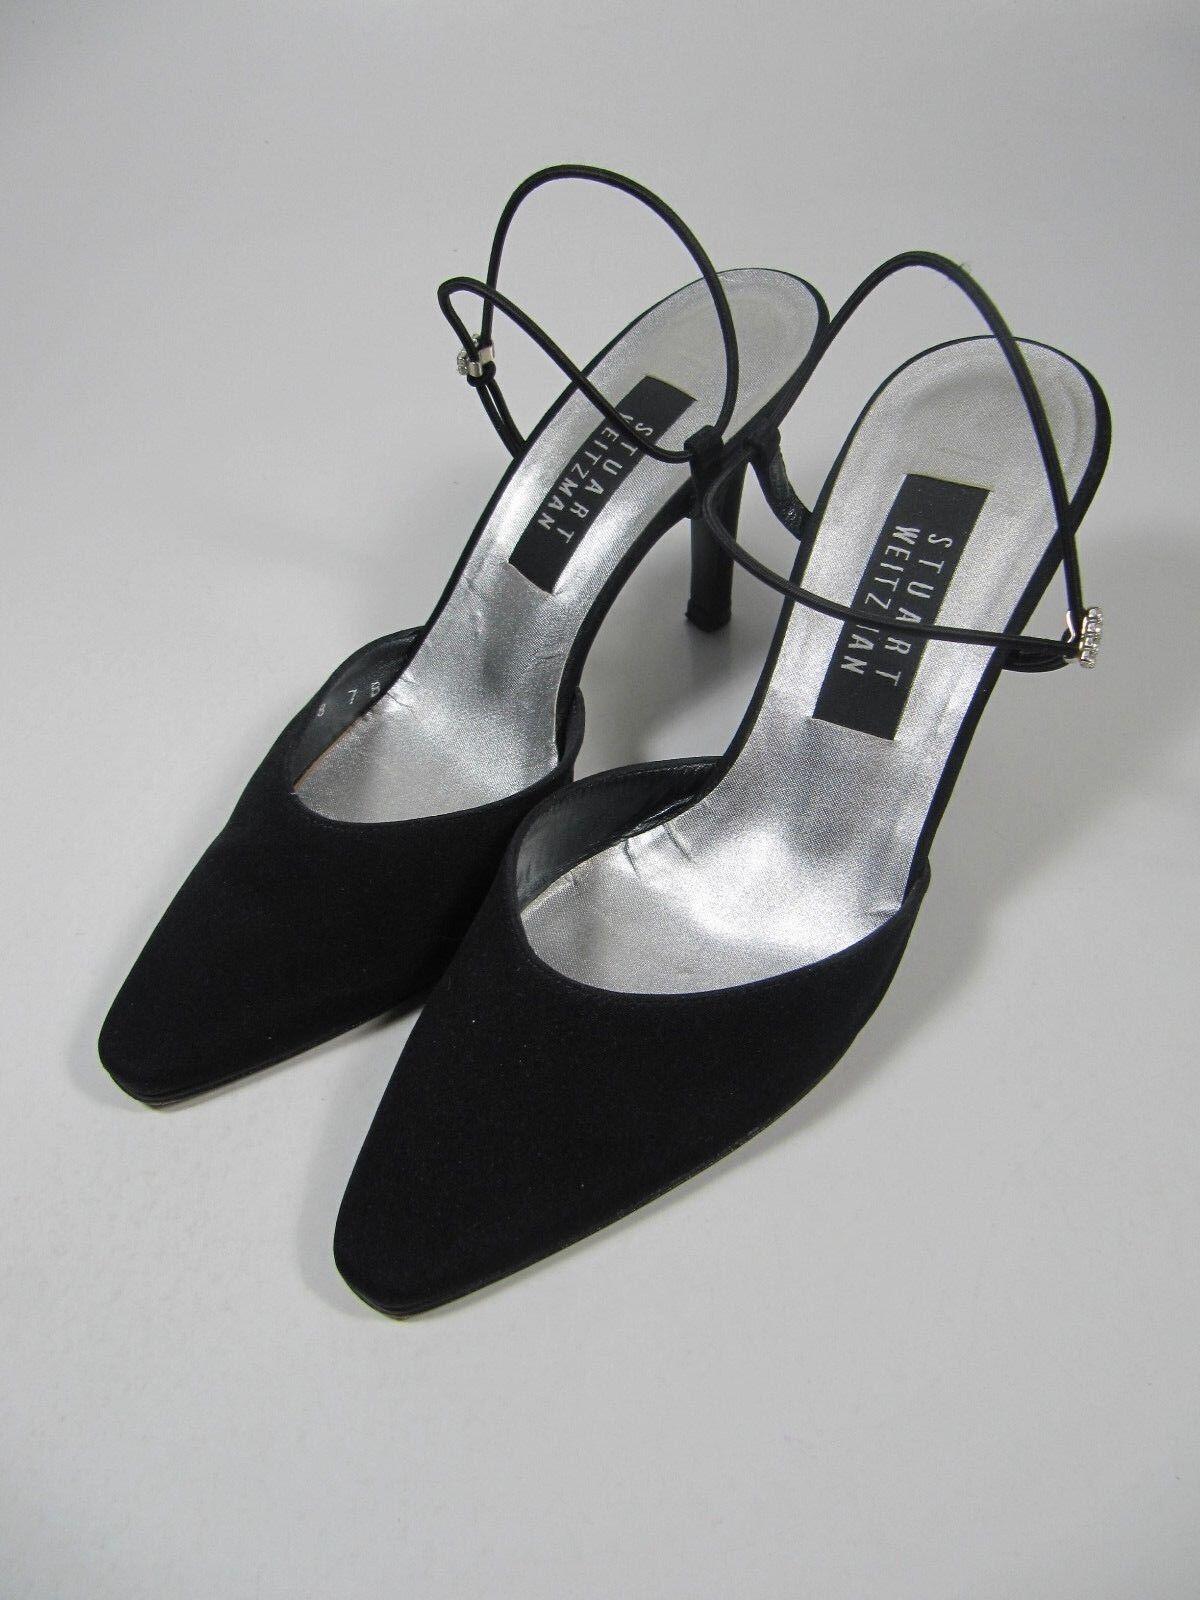 Stuart Weitzman Womens shoes Size 7B Black Slingback Strap Heels Pumps Formal